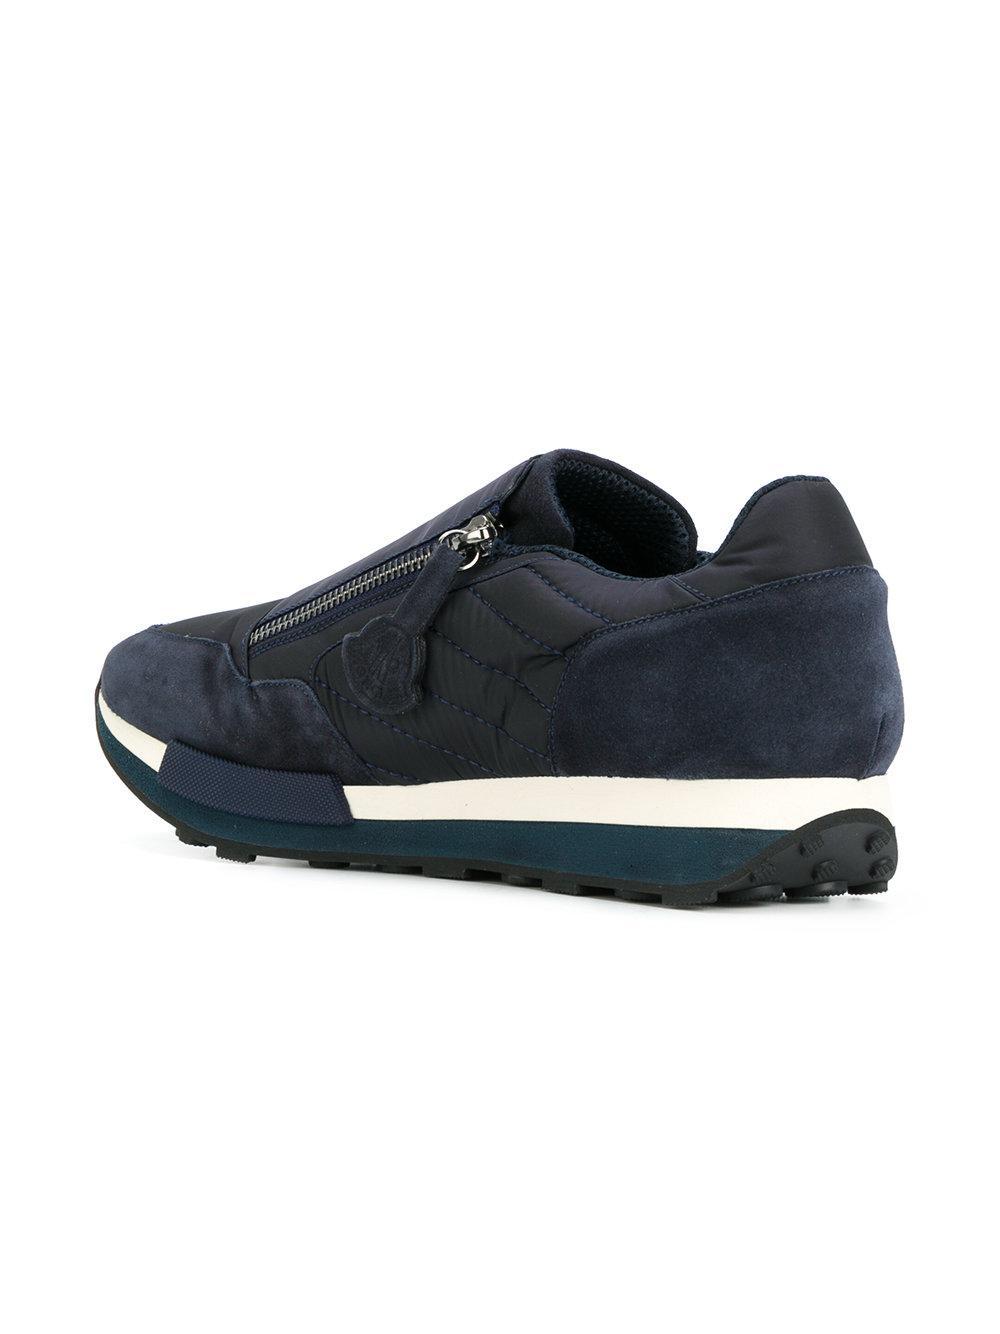 Moncler Rubber Zip Detail Low Top Sneakers in Blue for Men